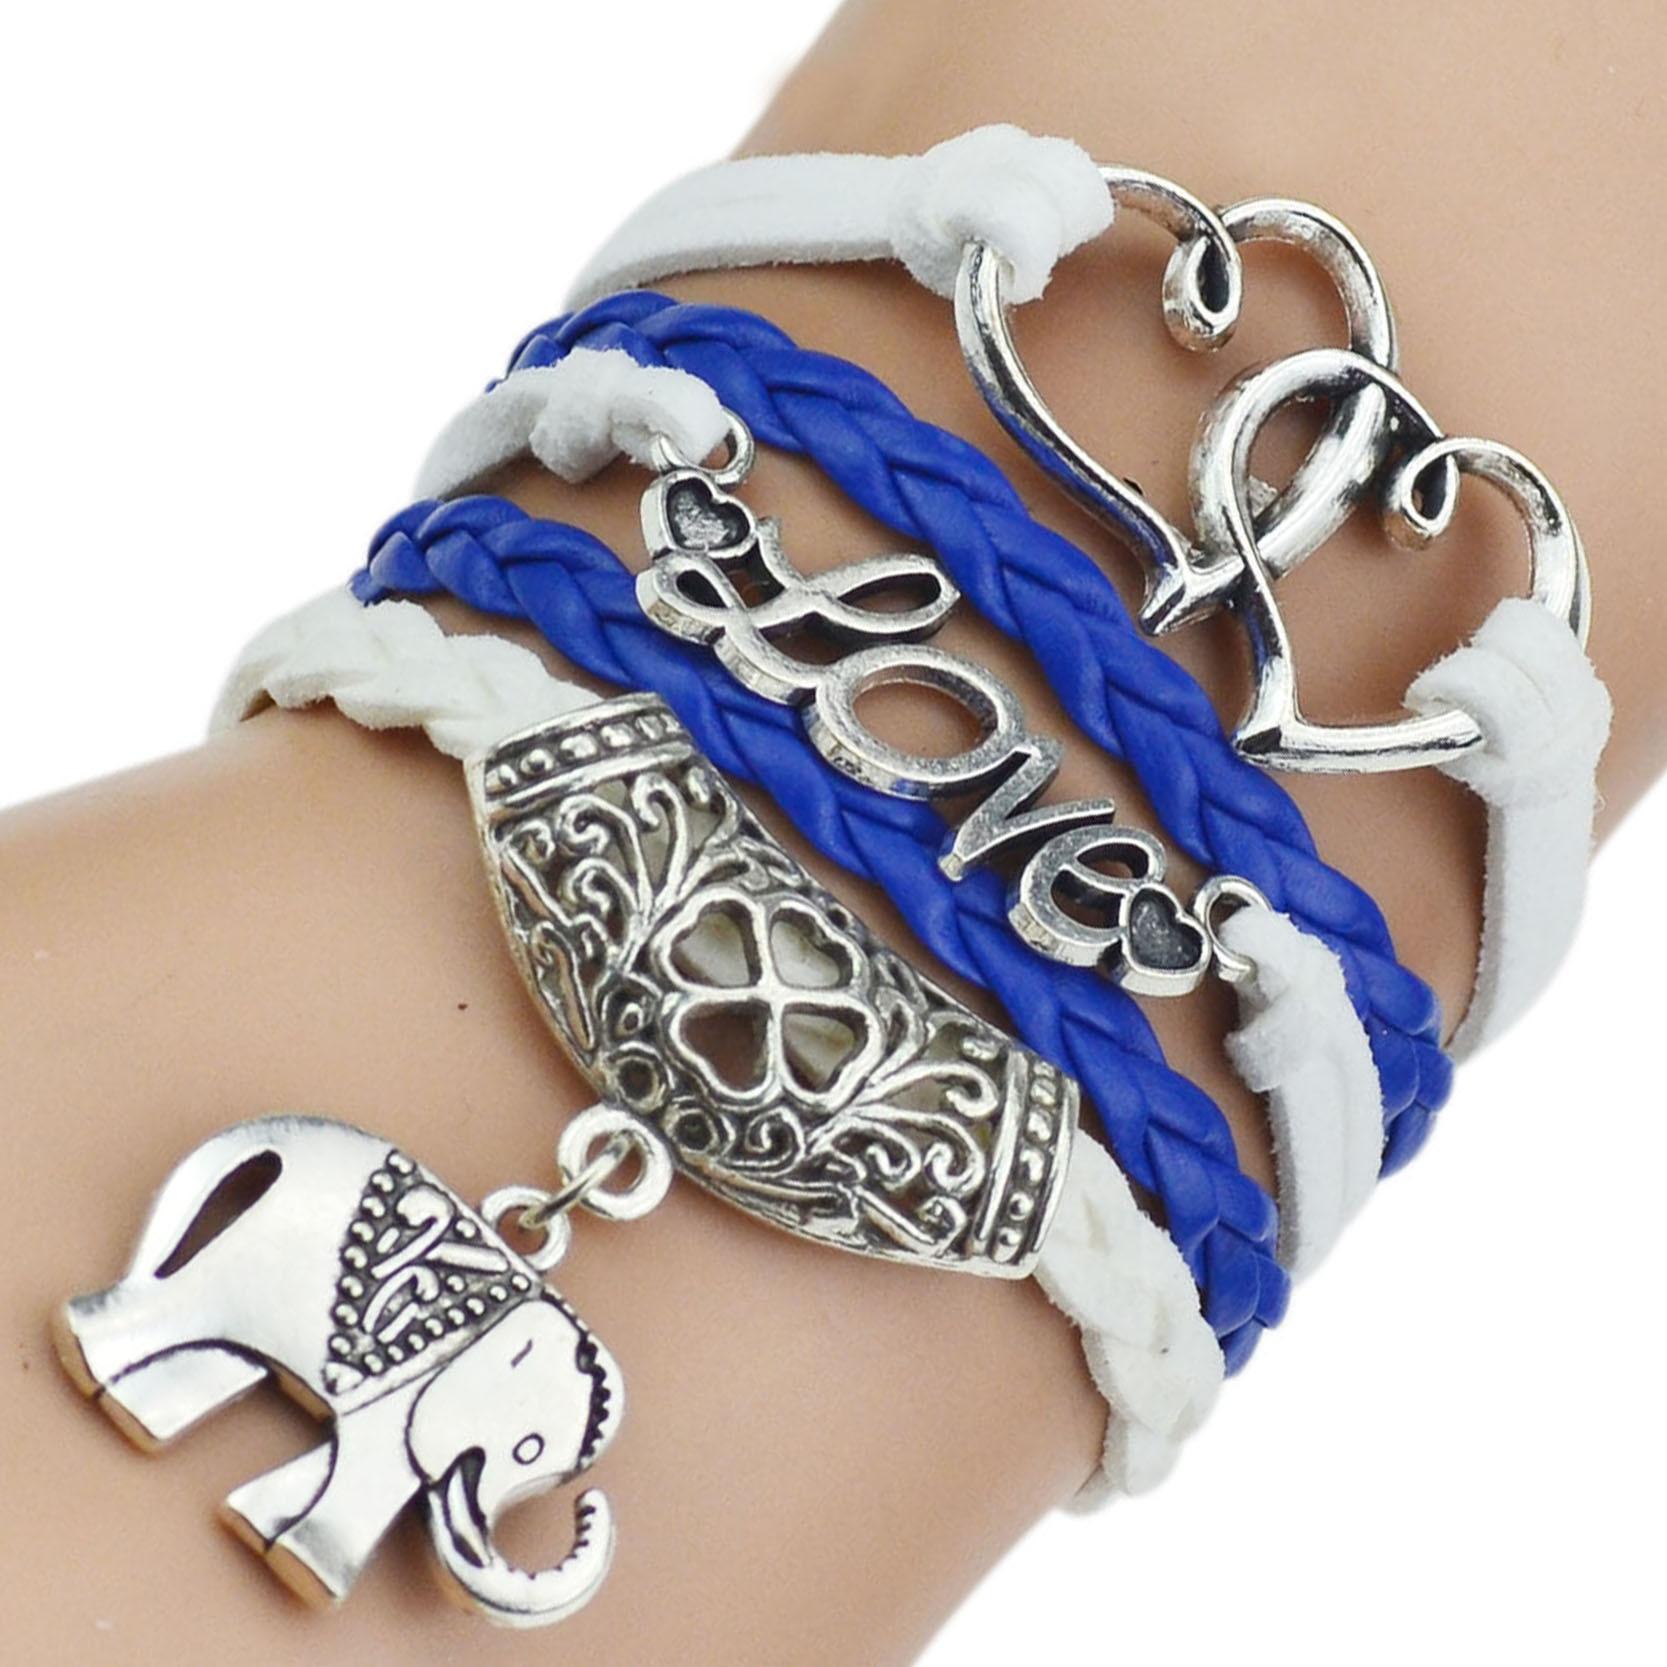 7 Colors 2017 New Fashion Leather Bracelets & Bangles Silver Owl Tree Love Bracelets for Women Men Hot Sale Fashion Jewelry 3